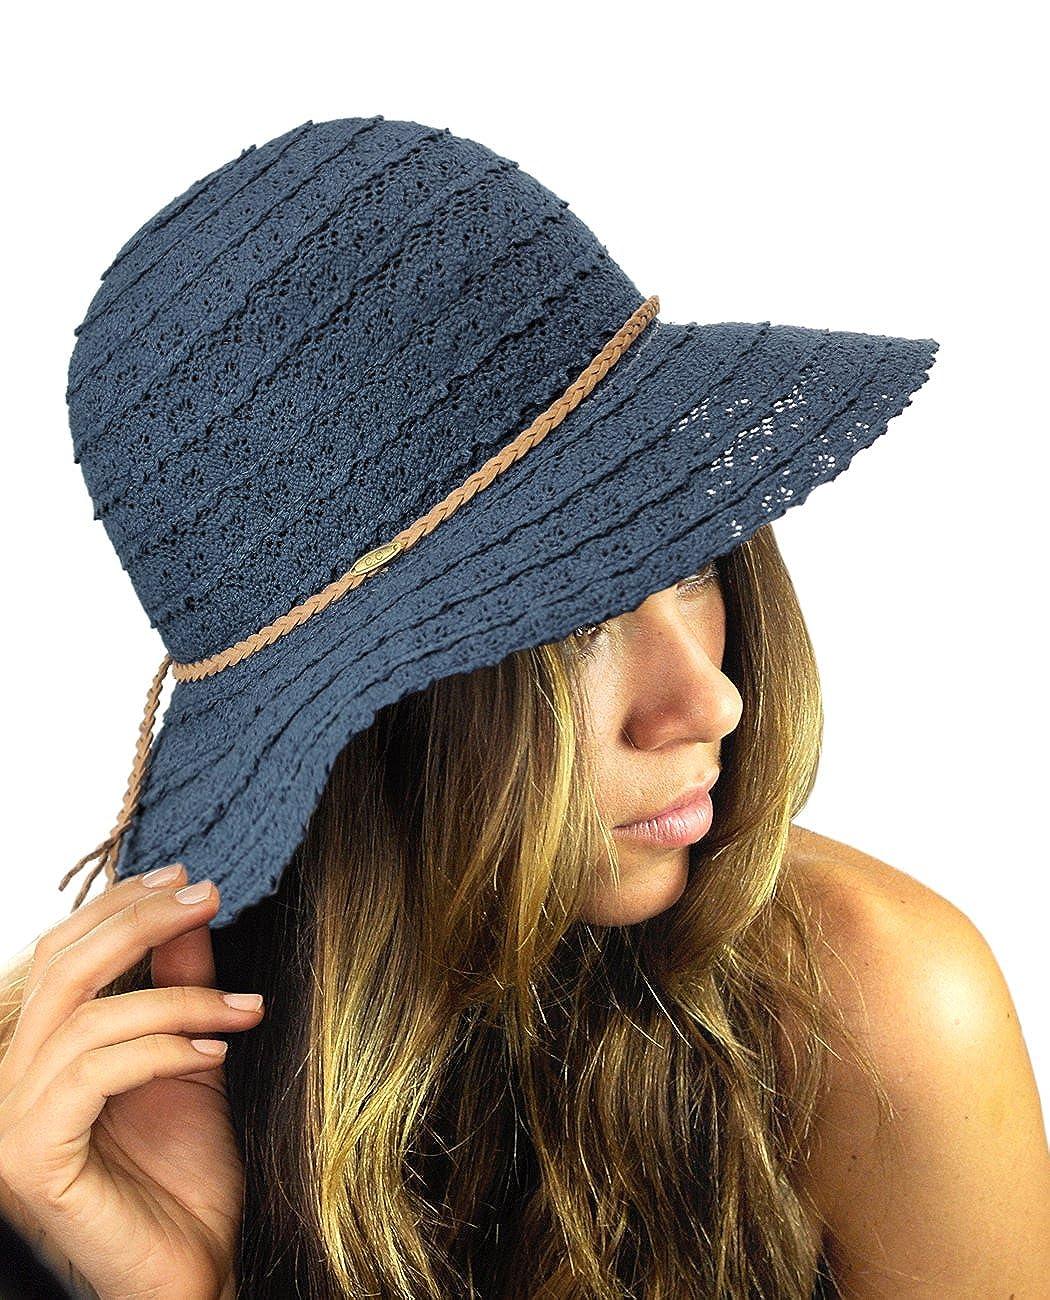 NYFASHION101 Open Knit Brown Braided Trim Vented Cotton Beach Sun Hat ST39-BG